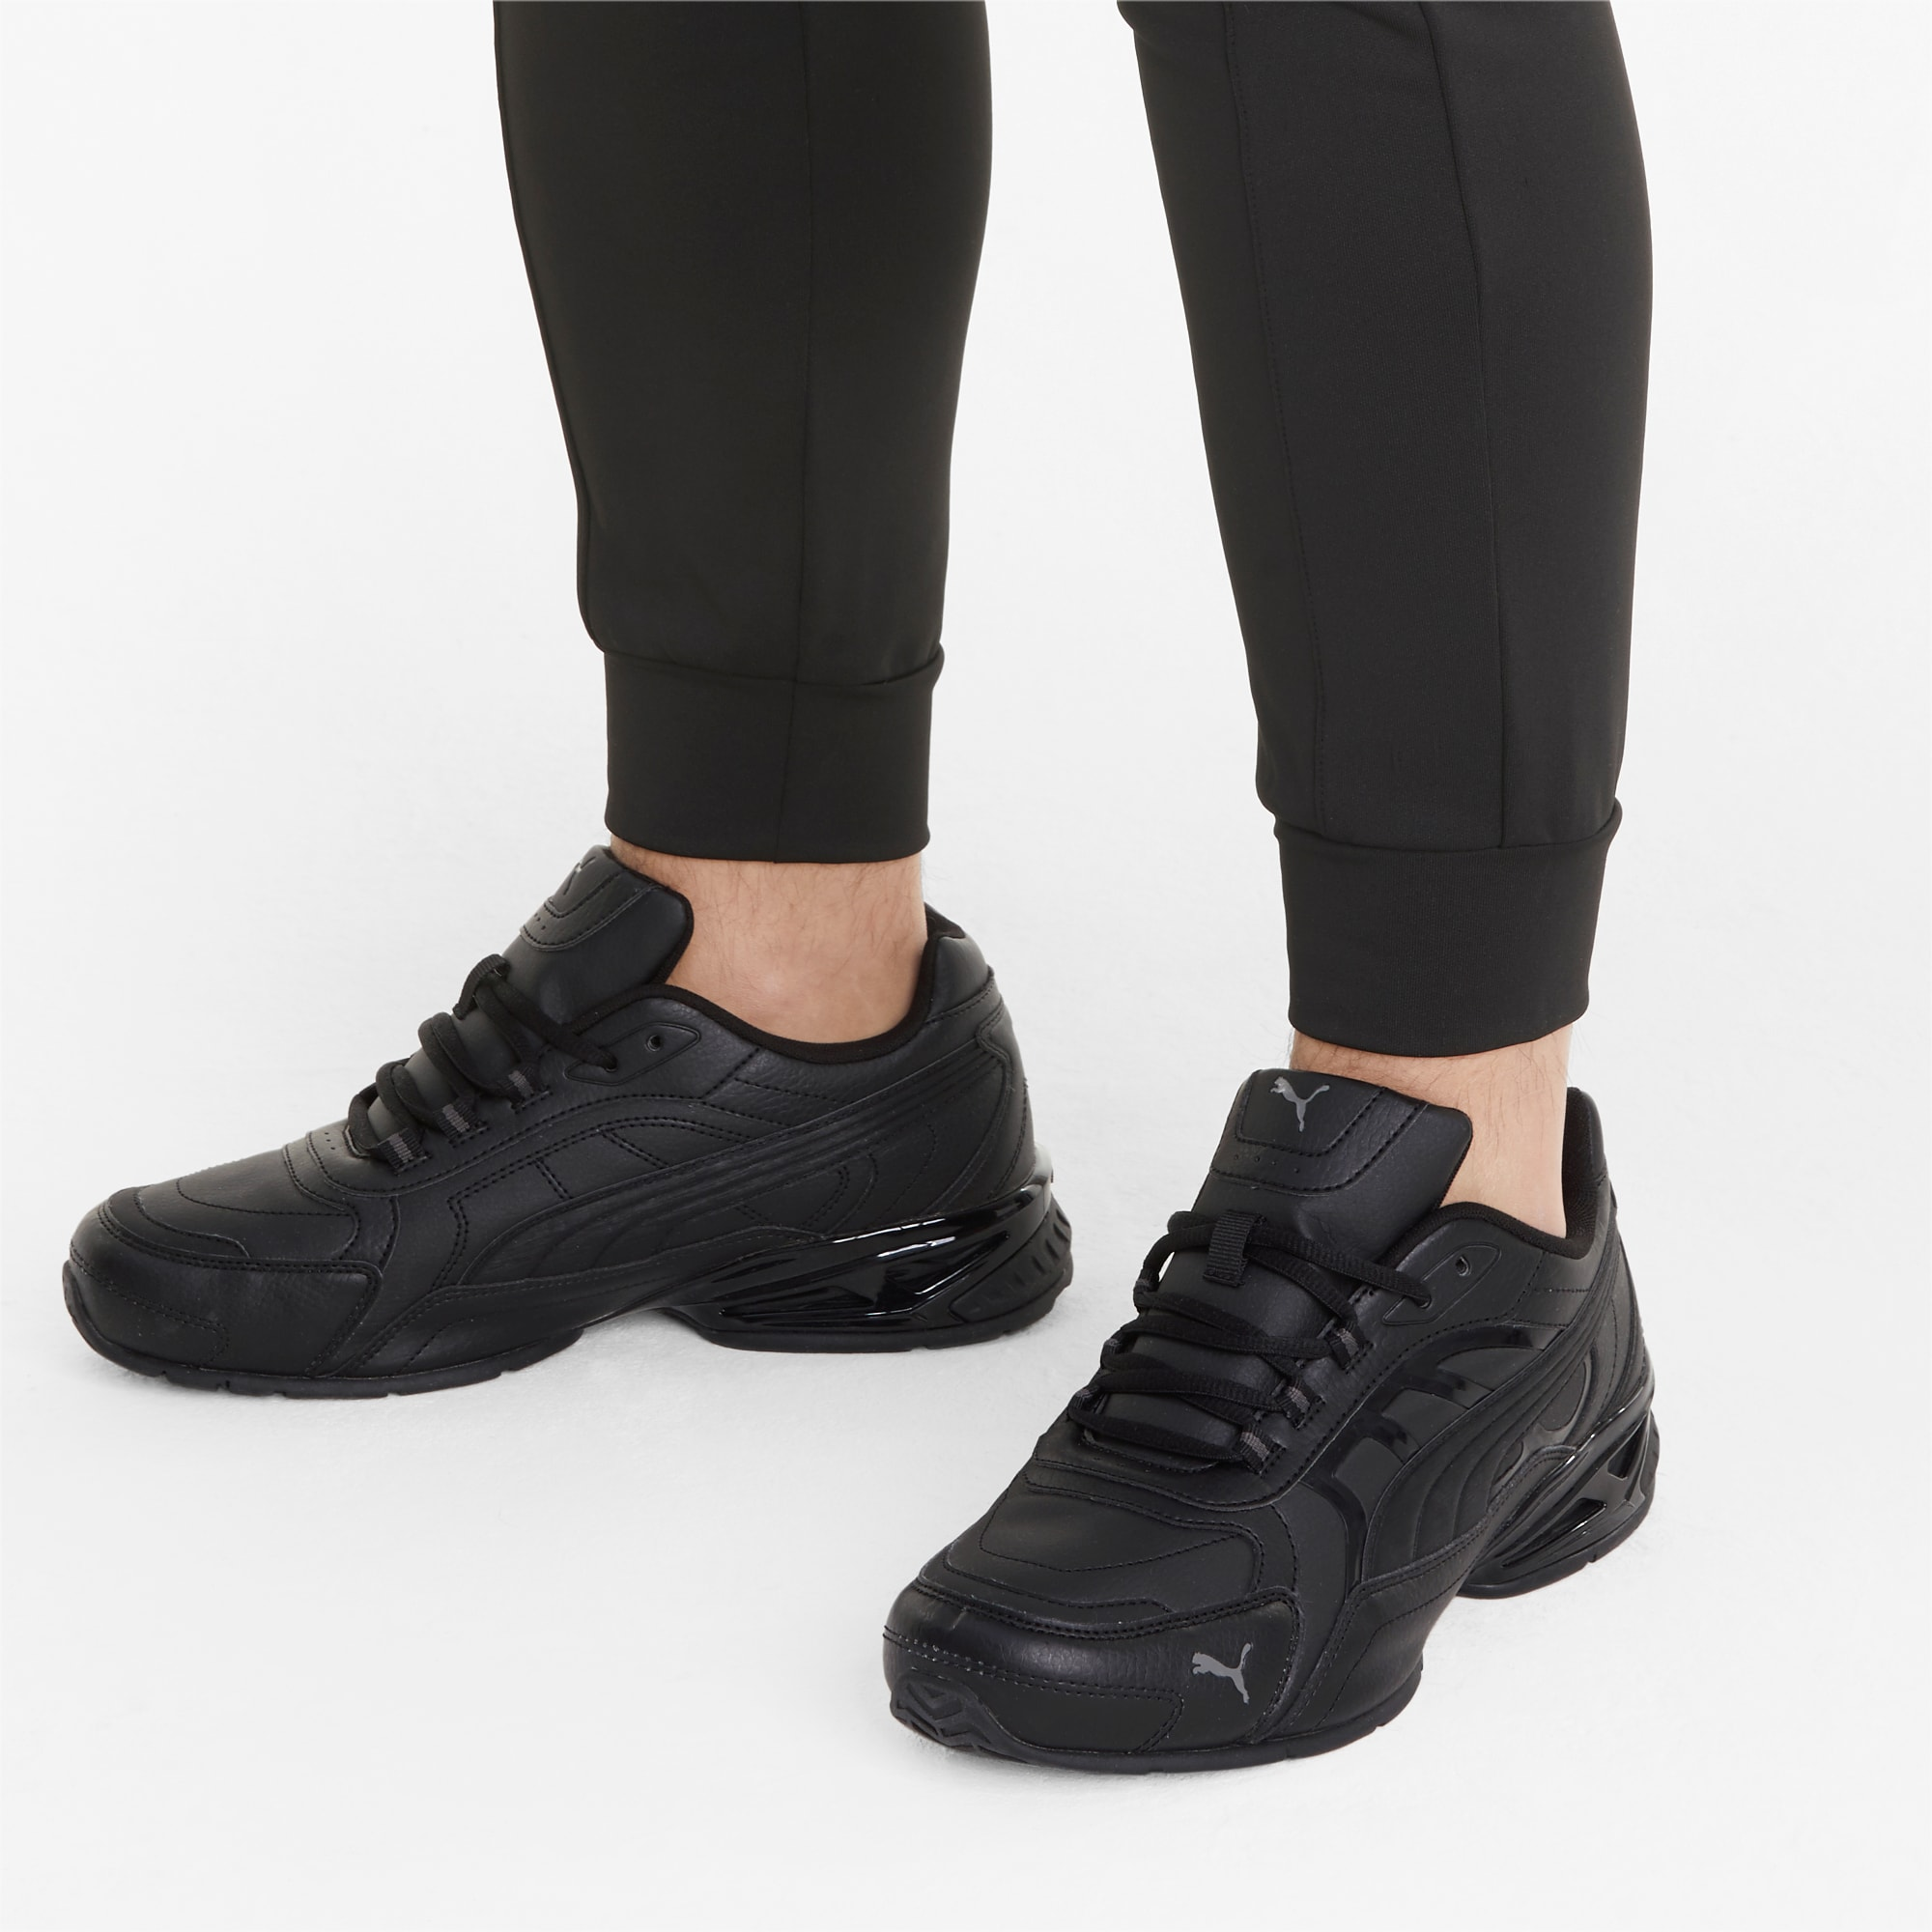 Respin SL Unsiex Shoes | Puma Black-Puma Black-CASTLEROCK | PUMA ...